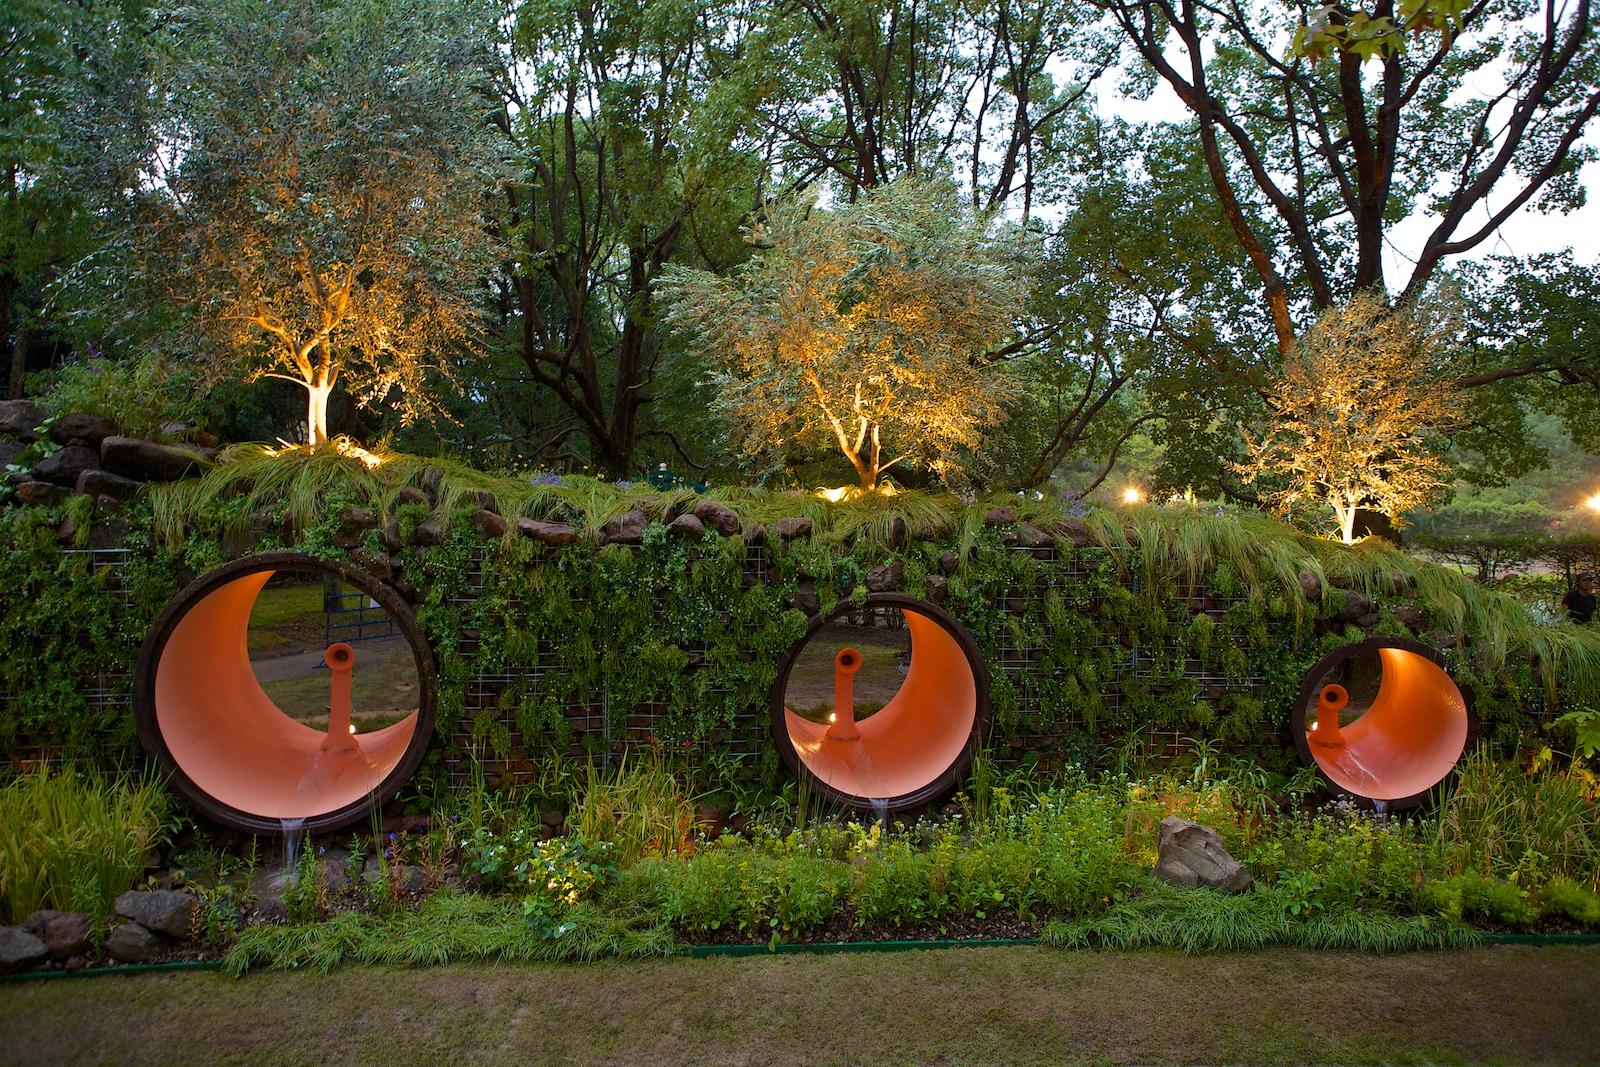 Giardino di Stegano Passerotti al gardeninn world cup japan, foto di Pietro Fantoni